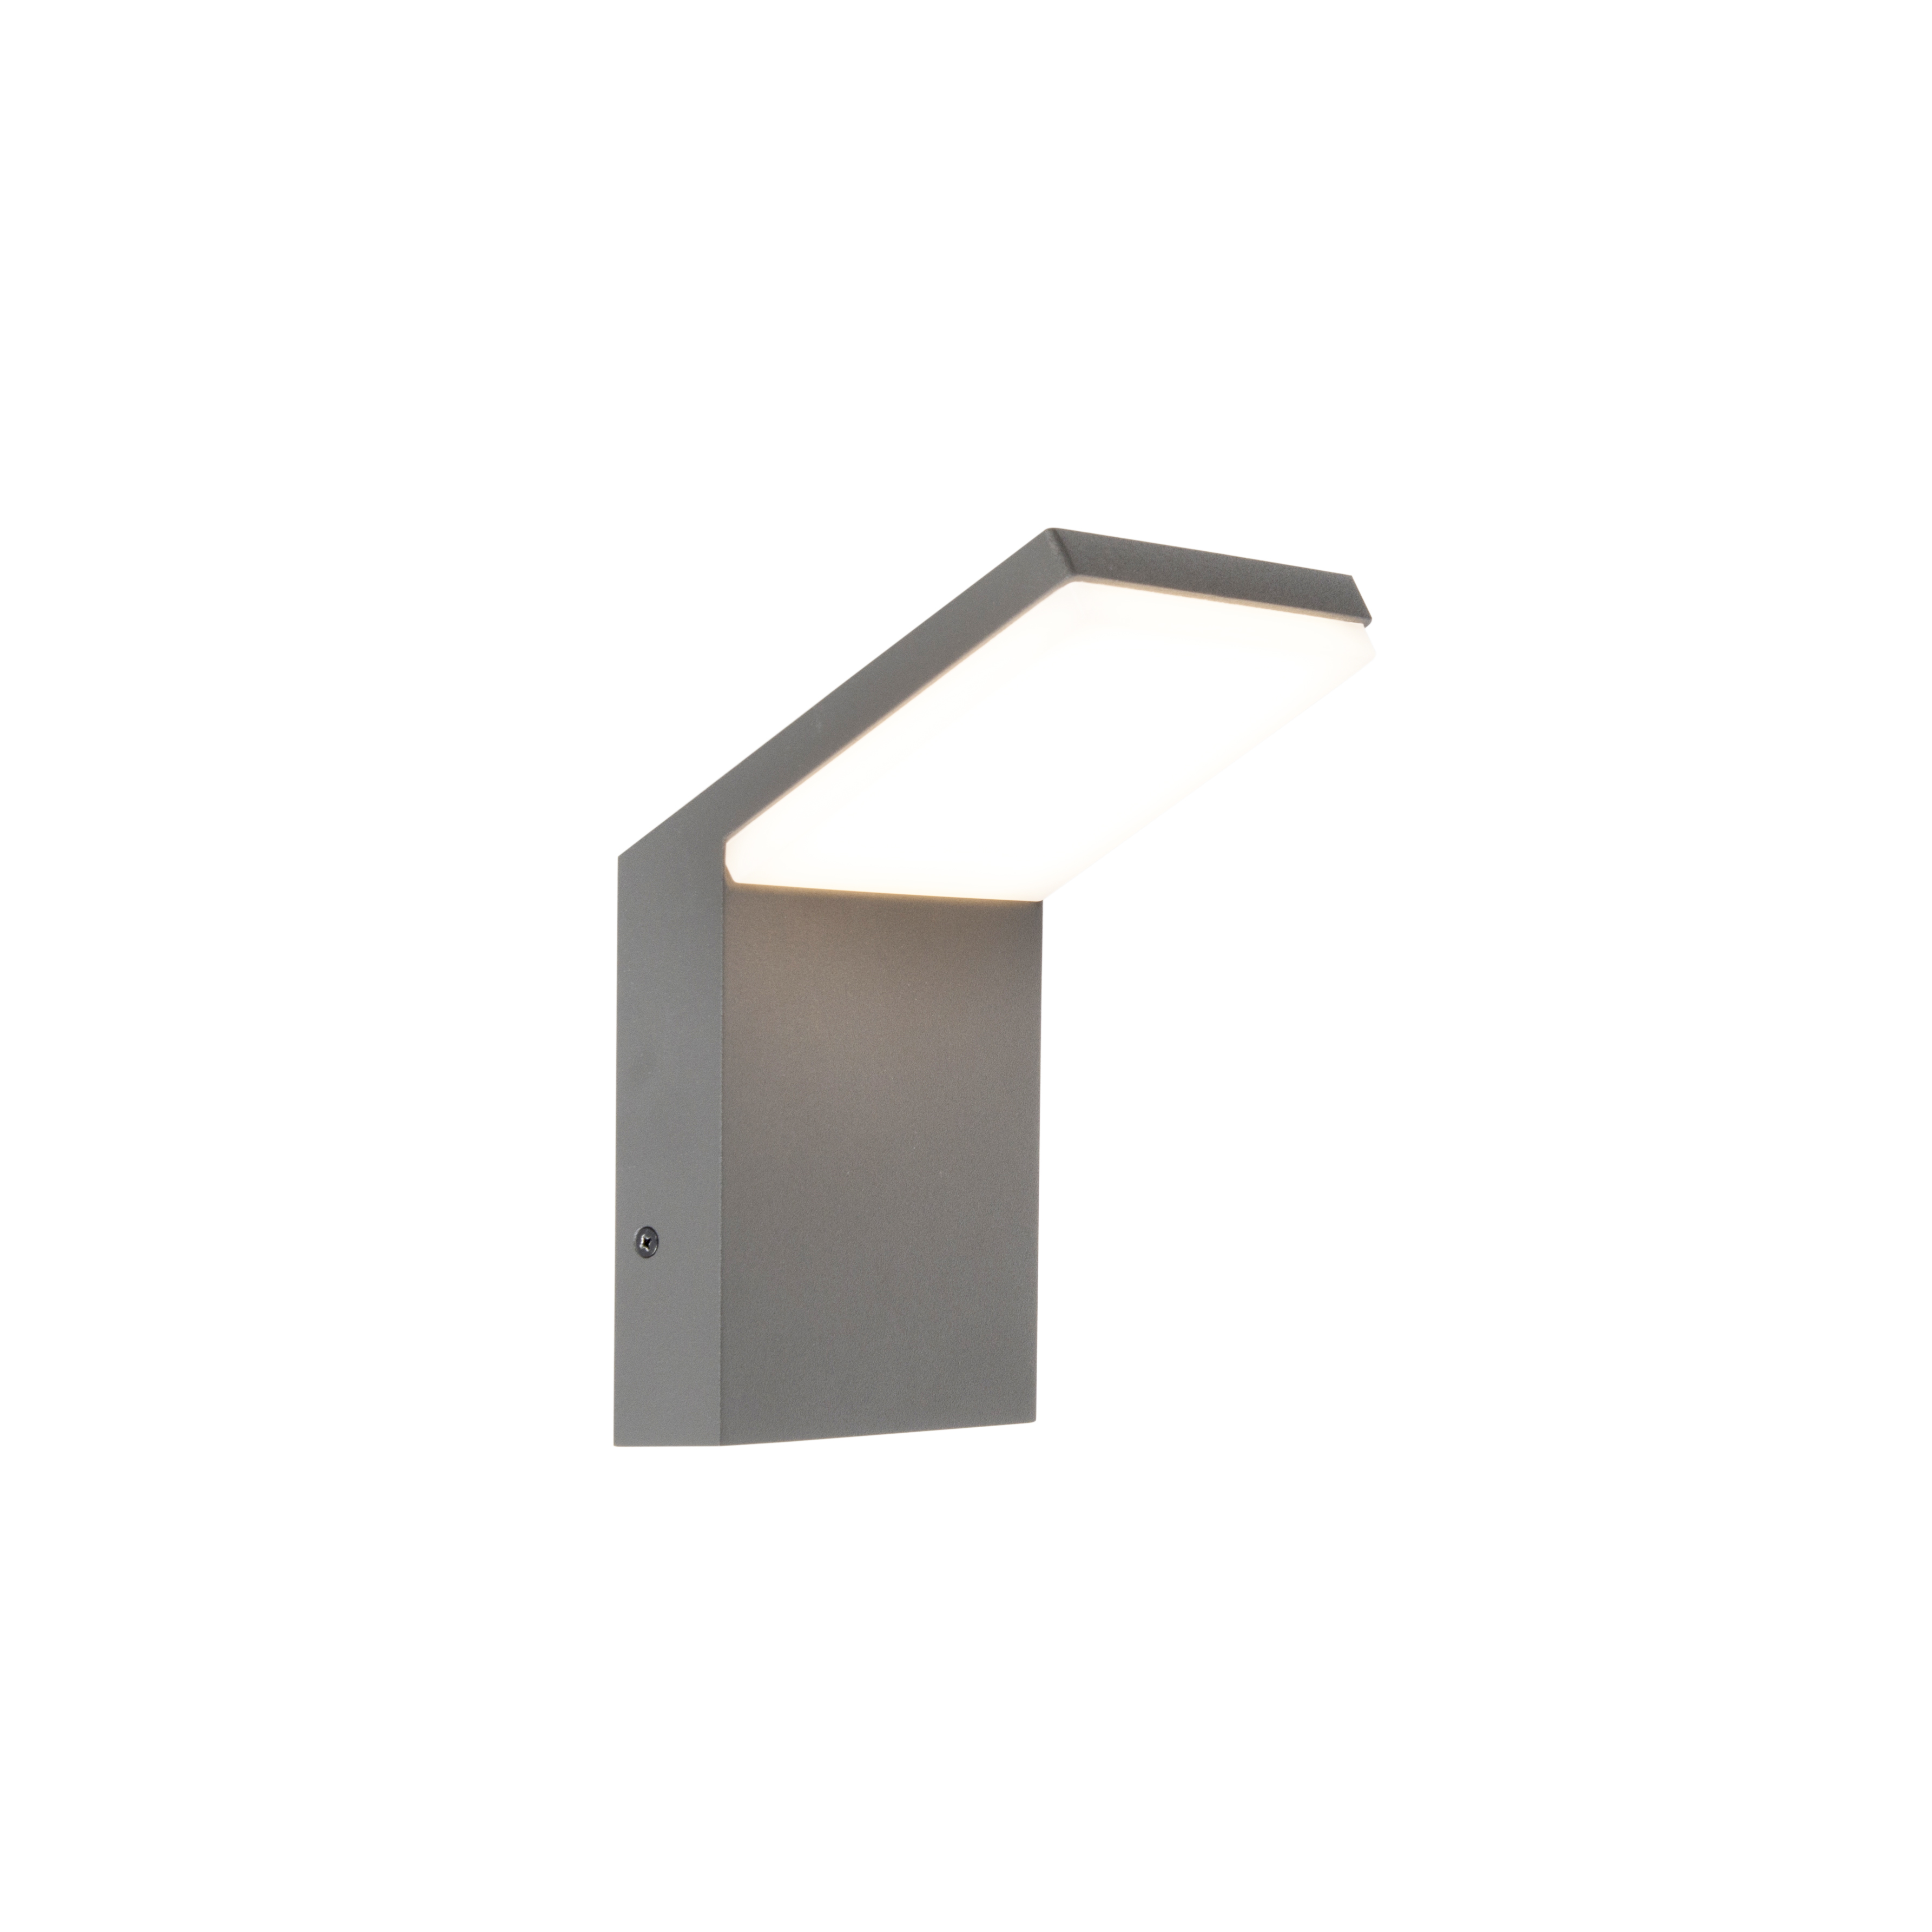 Moderne wand buitenlamp donker grijs incl. LED - Mapi